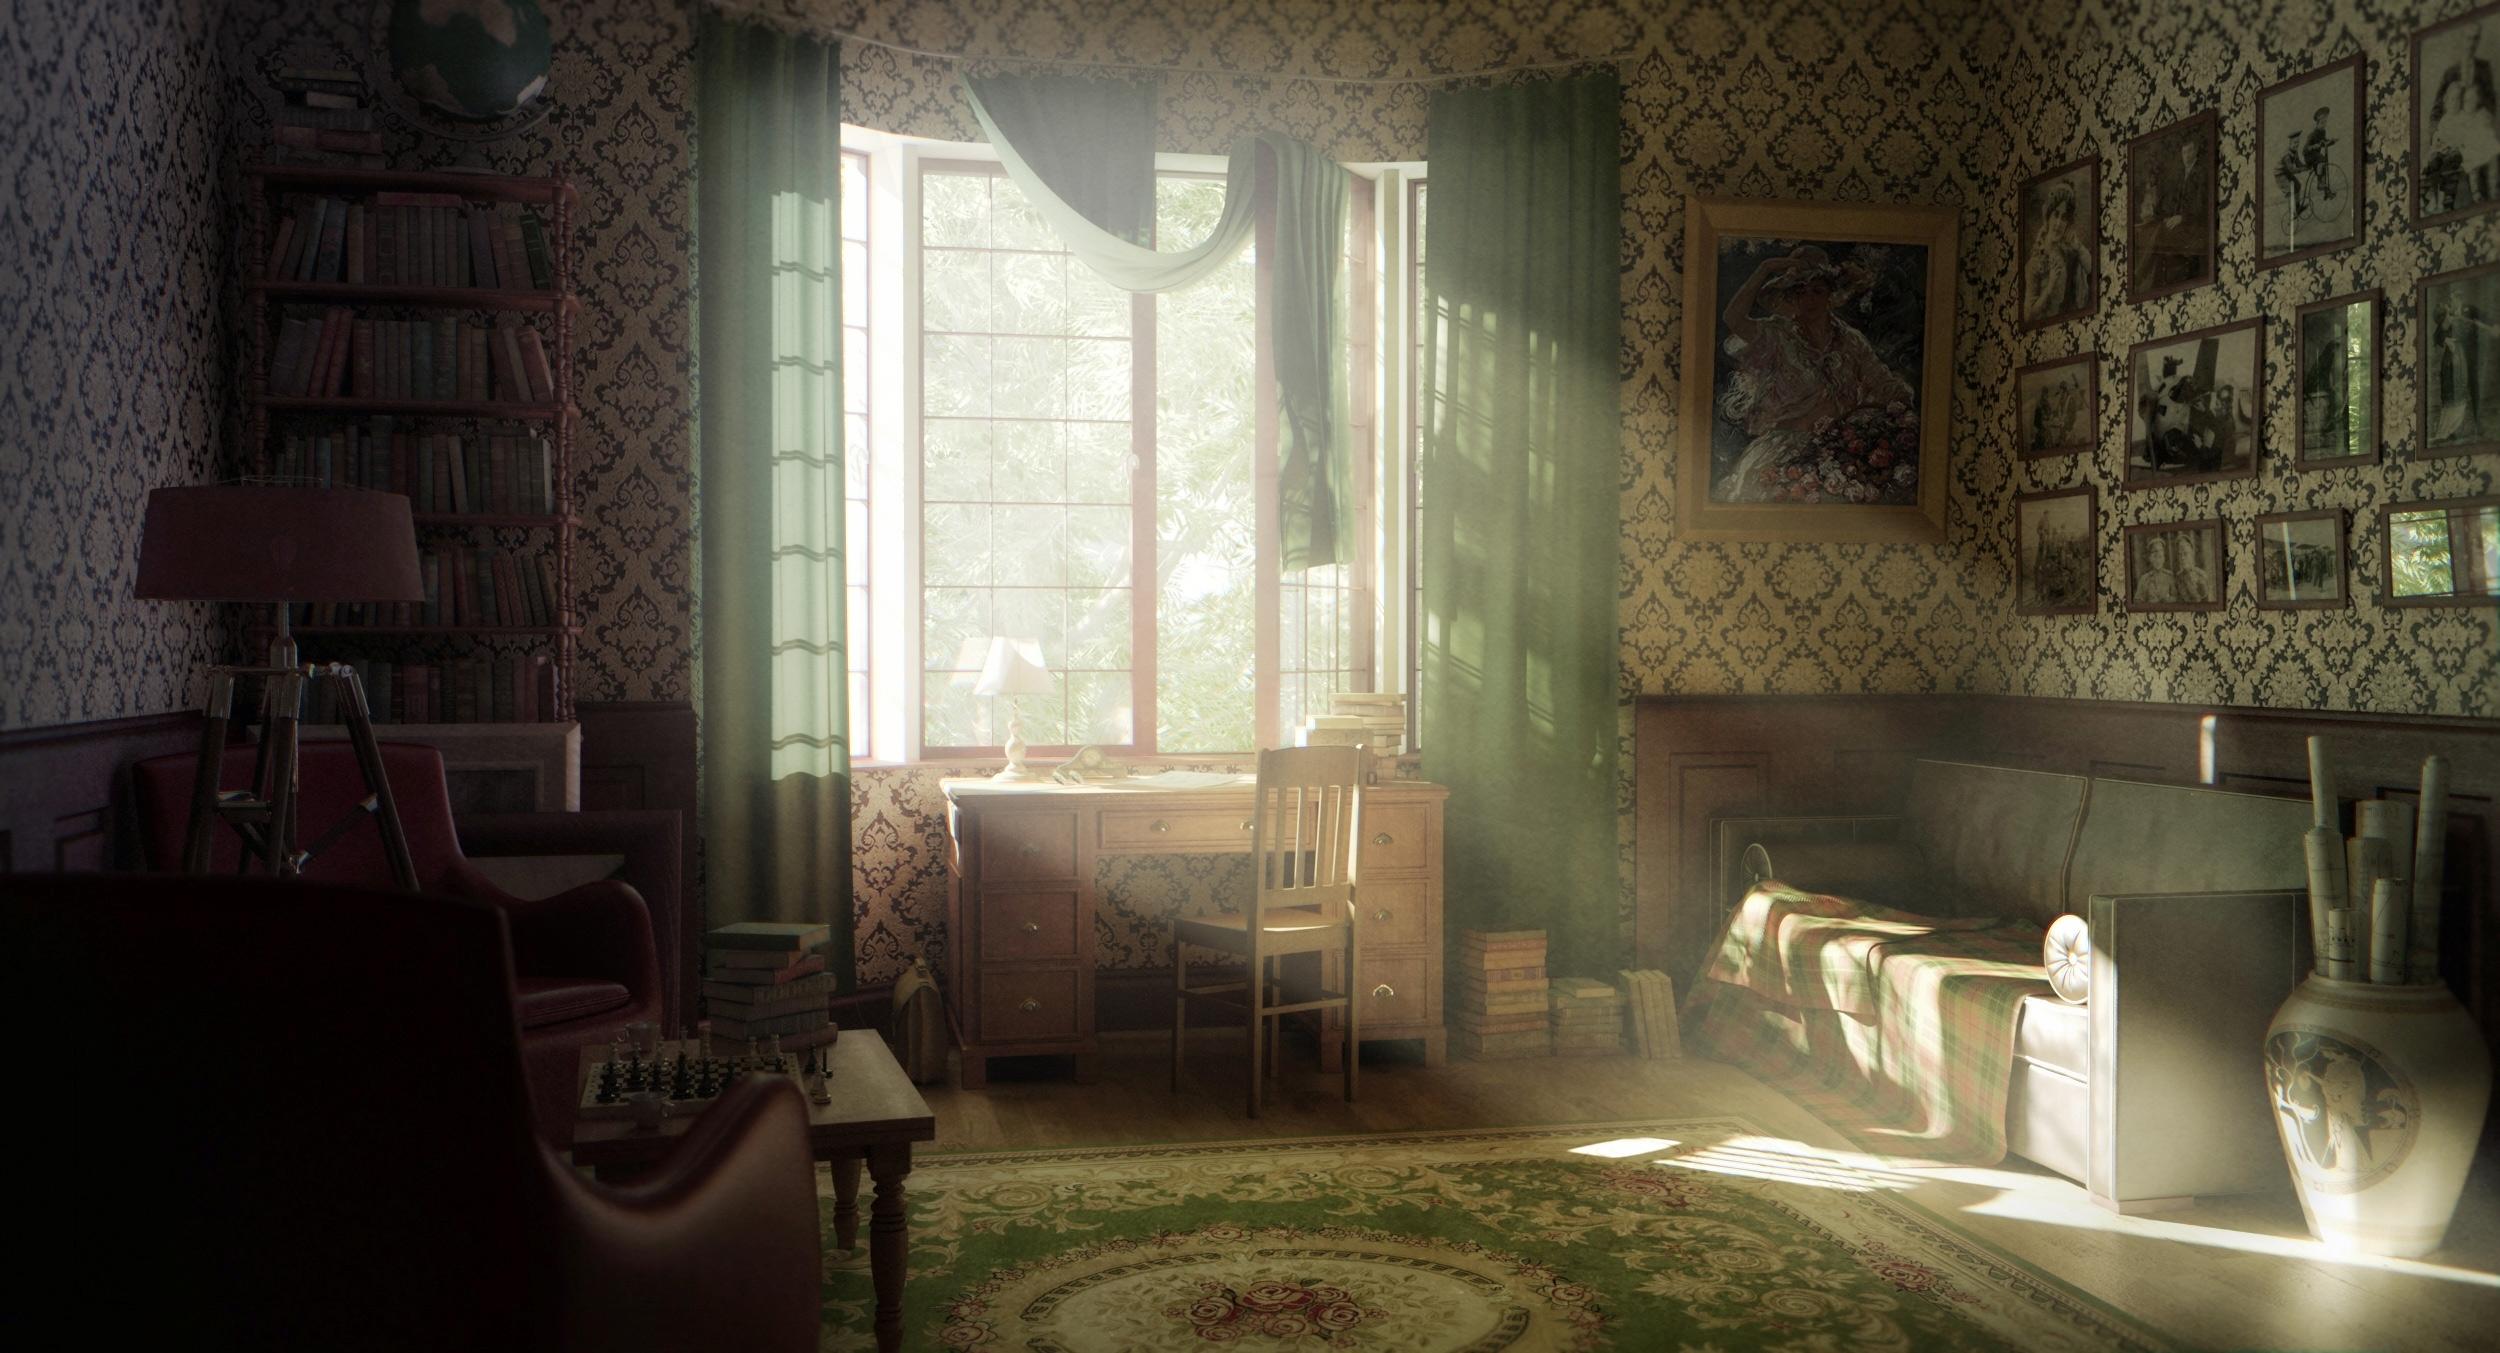 Interior design retro vintage warm sunlight room wallpaper for Wallpaper home old